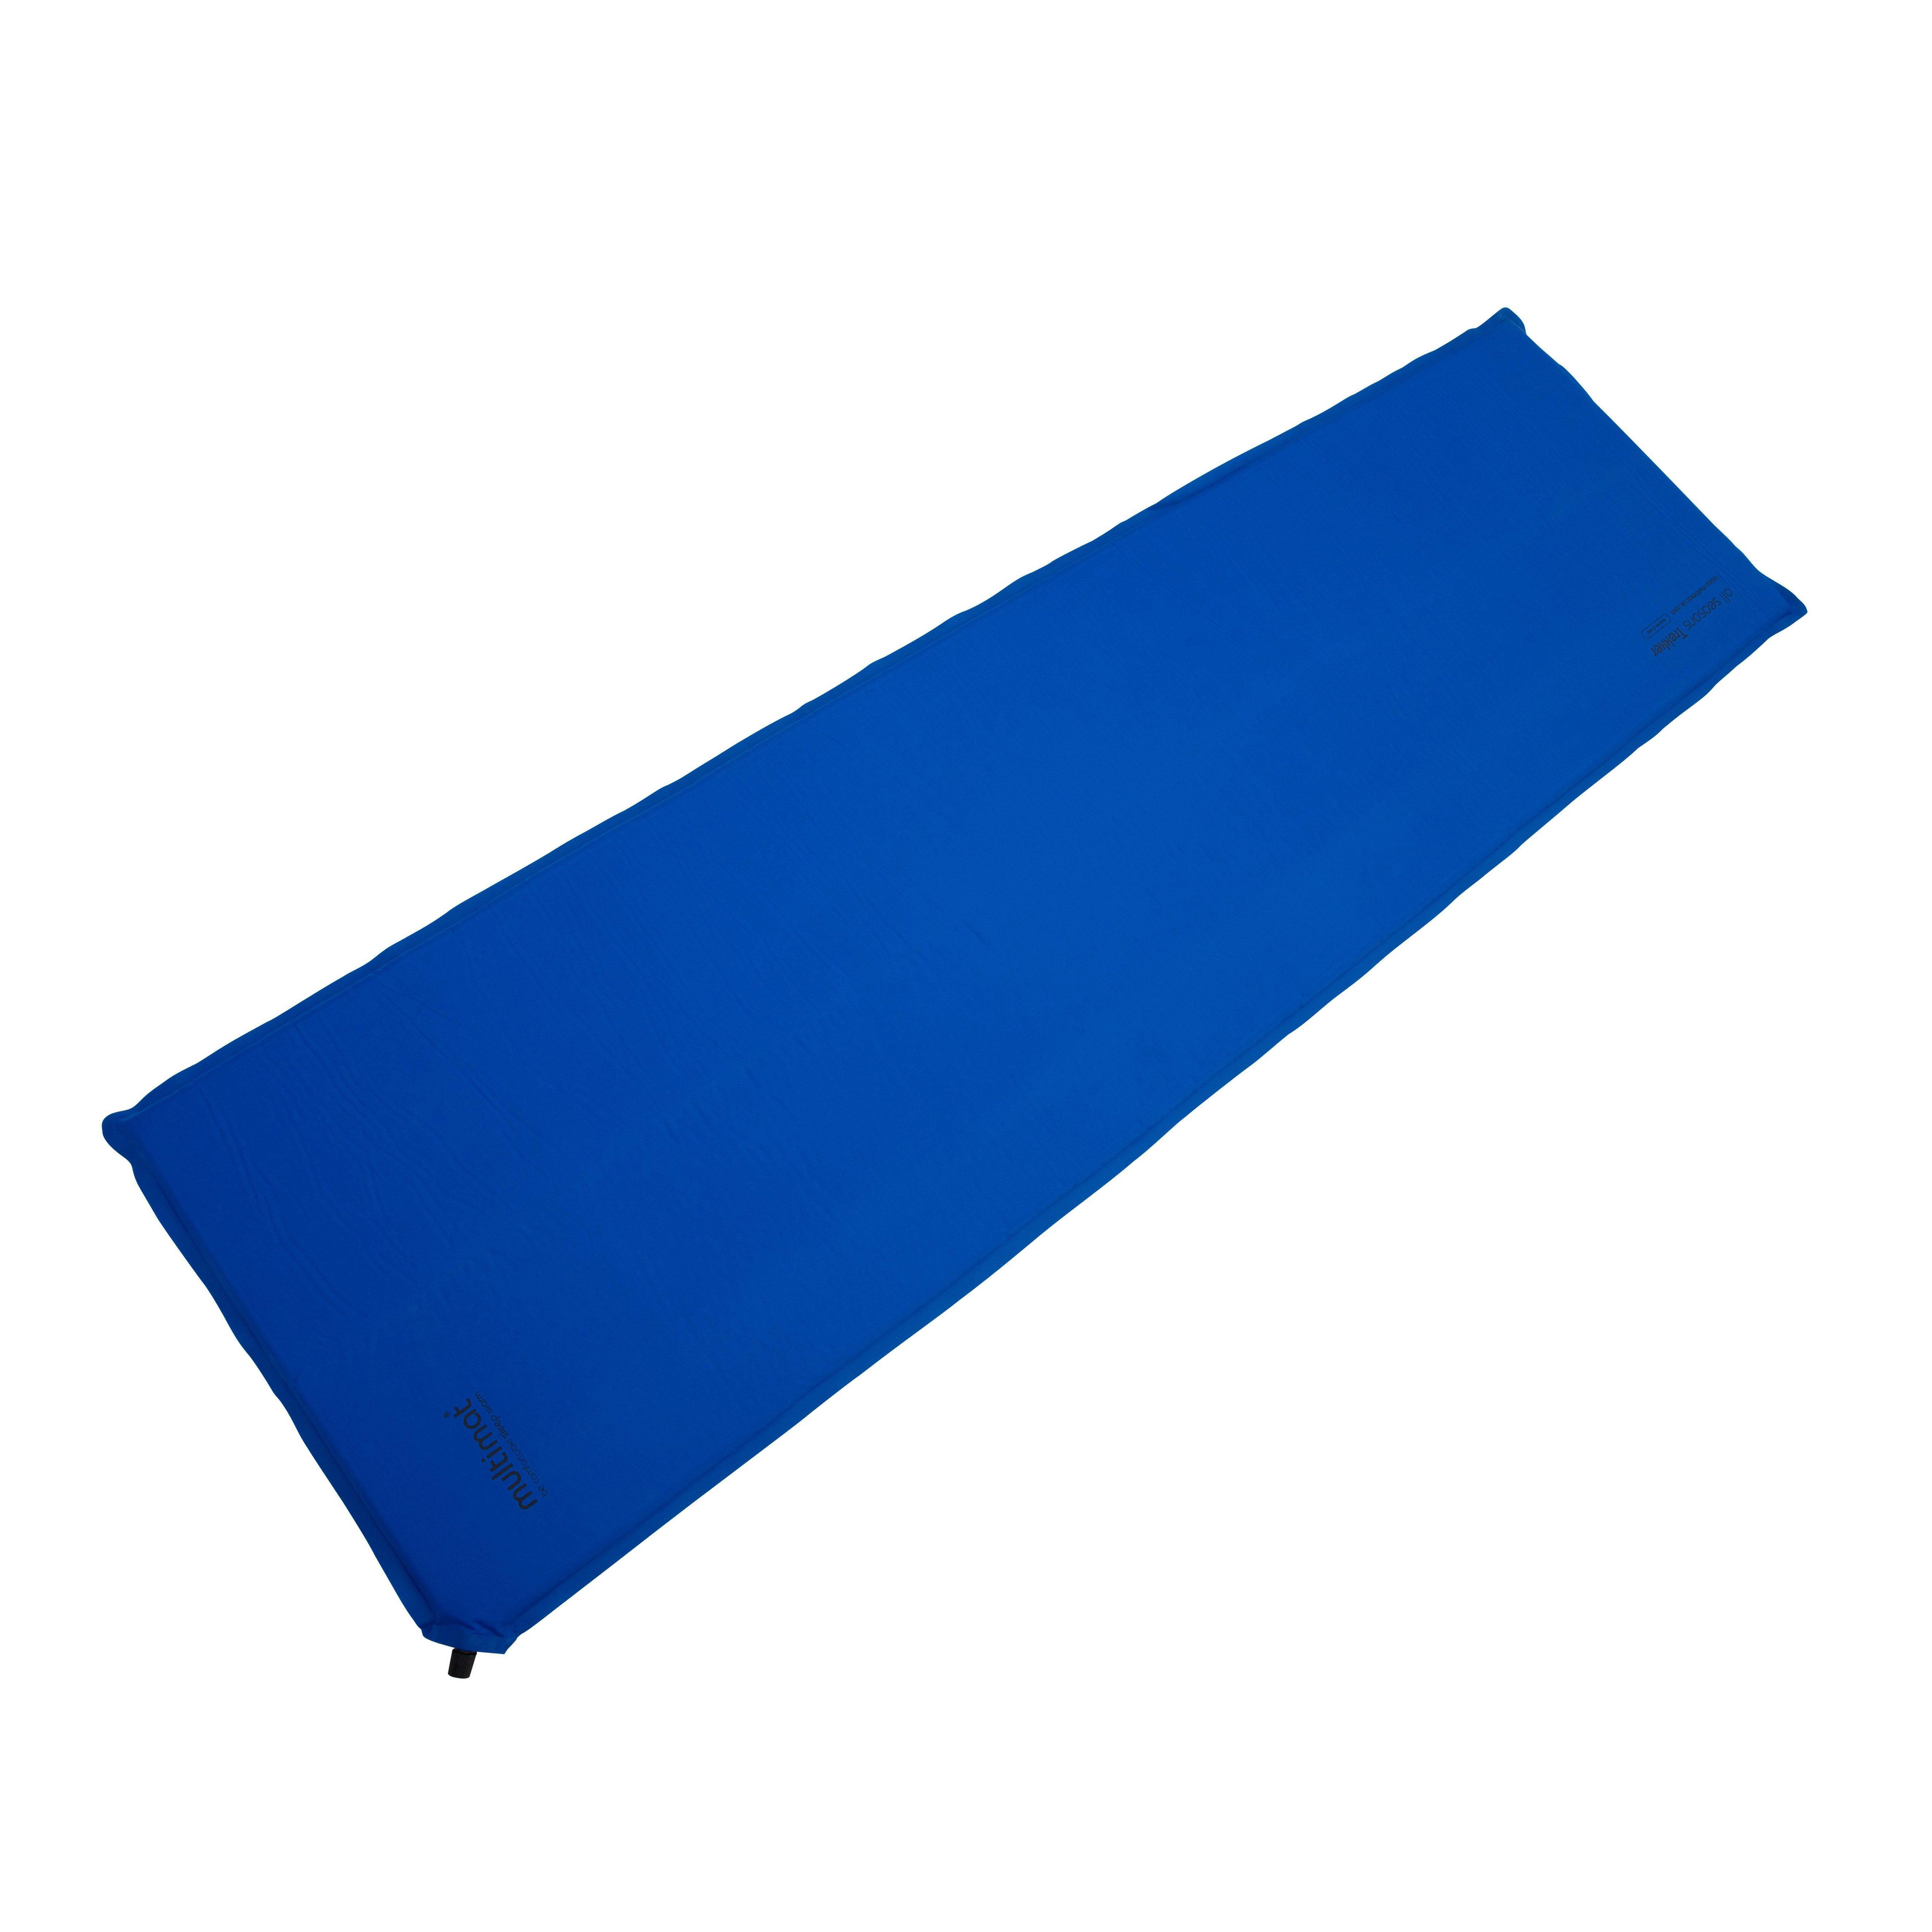 Multimat Trekker 25 Self Inflating Sleeping Mat - Blue  Blue